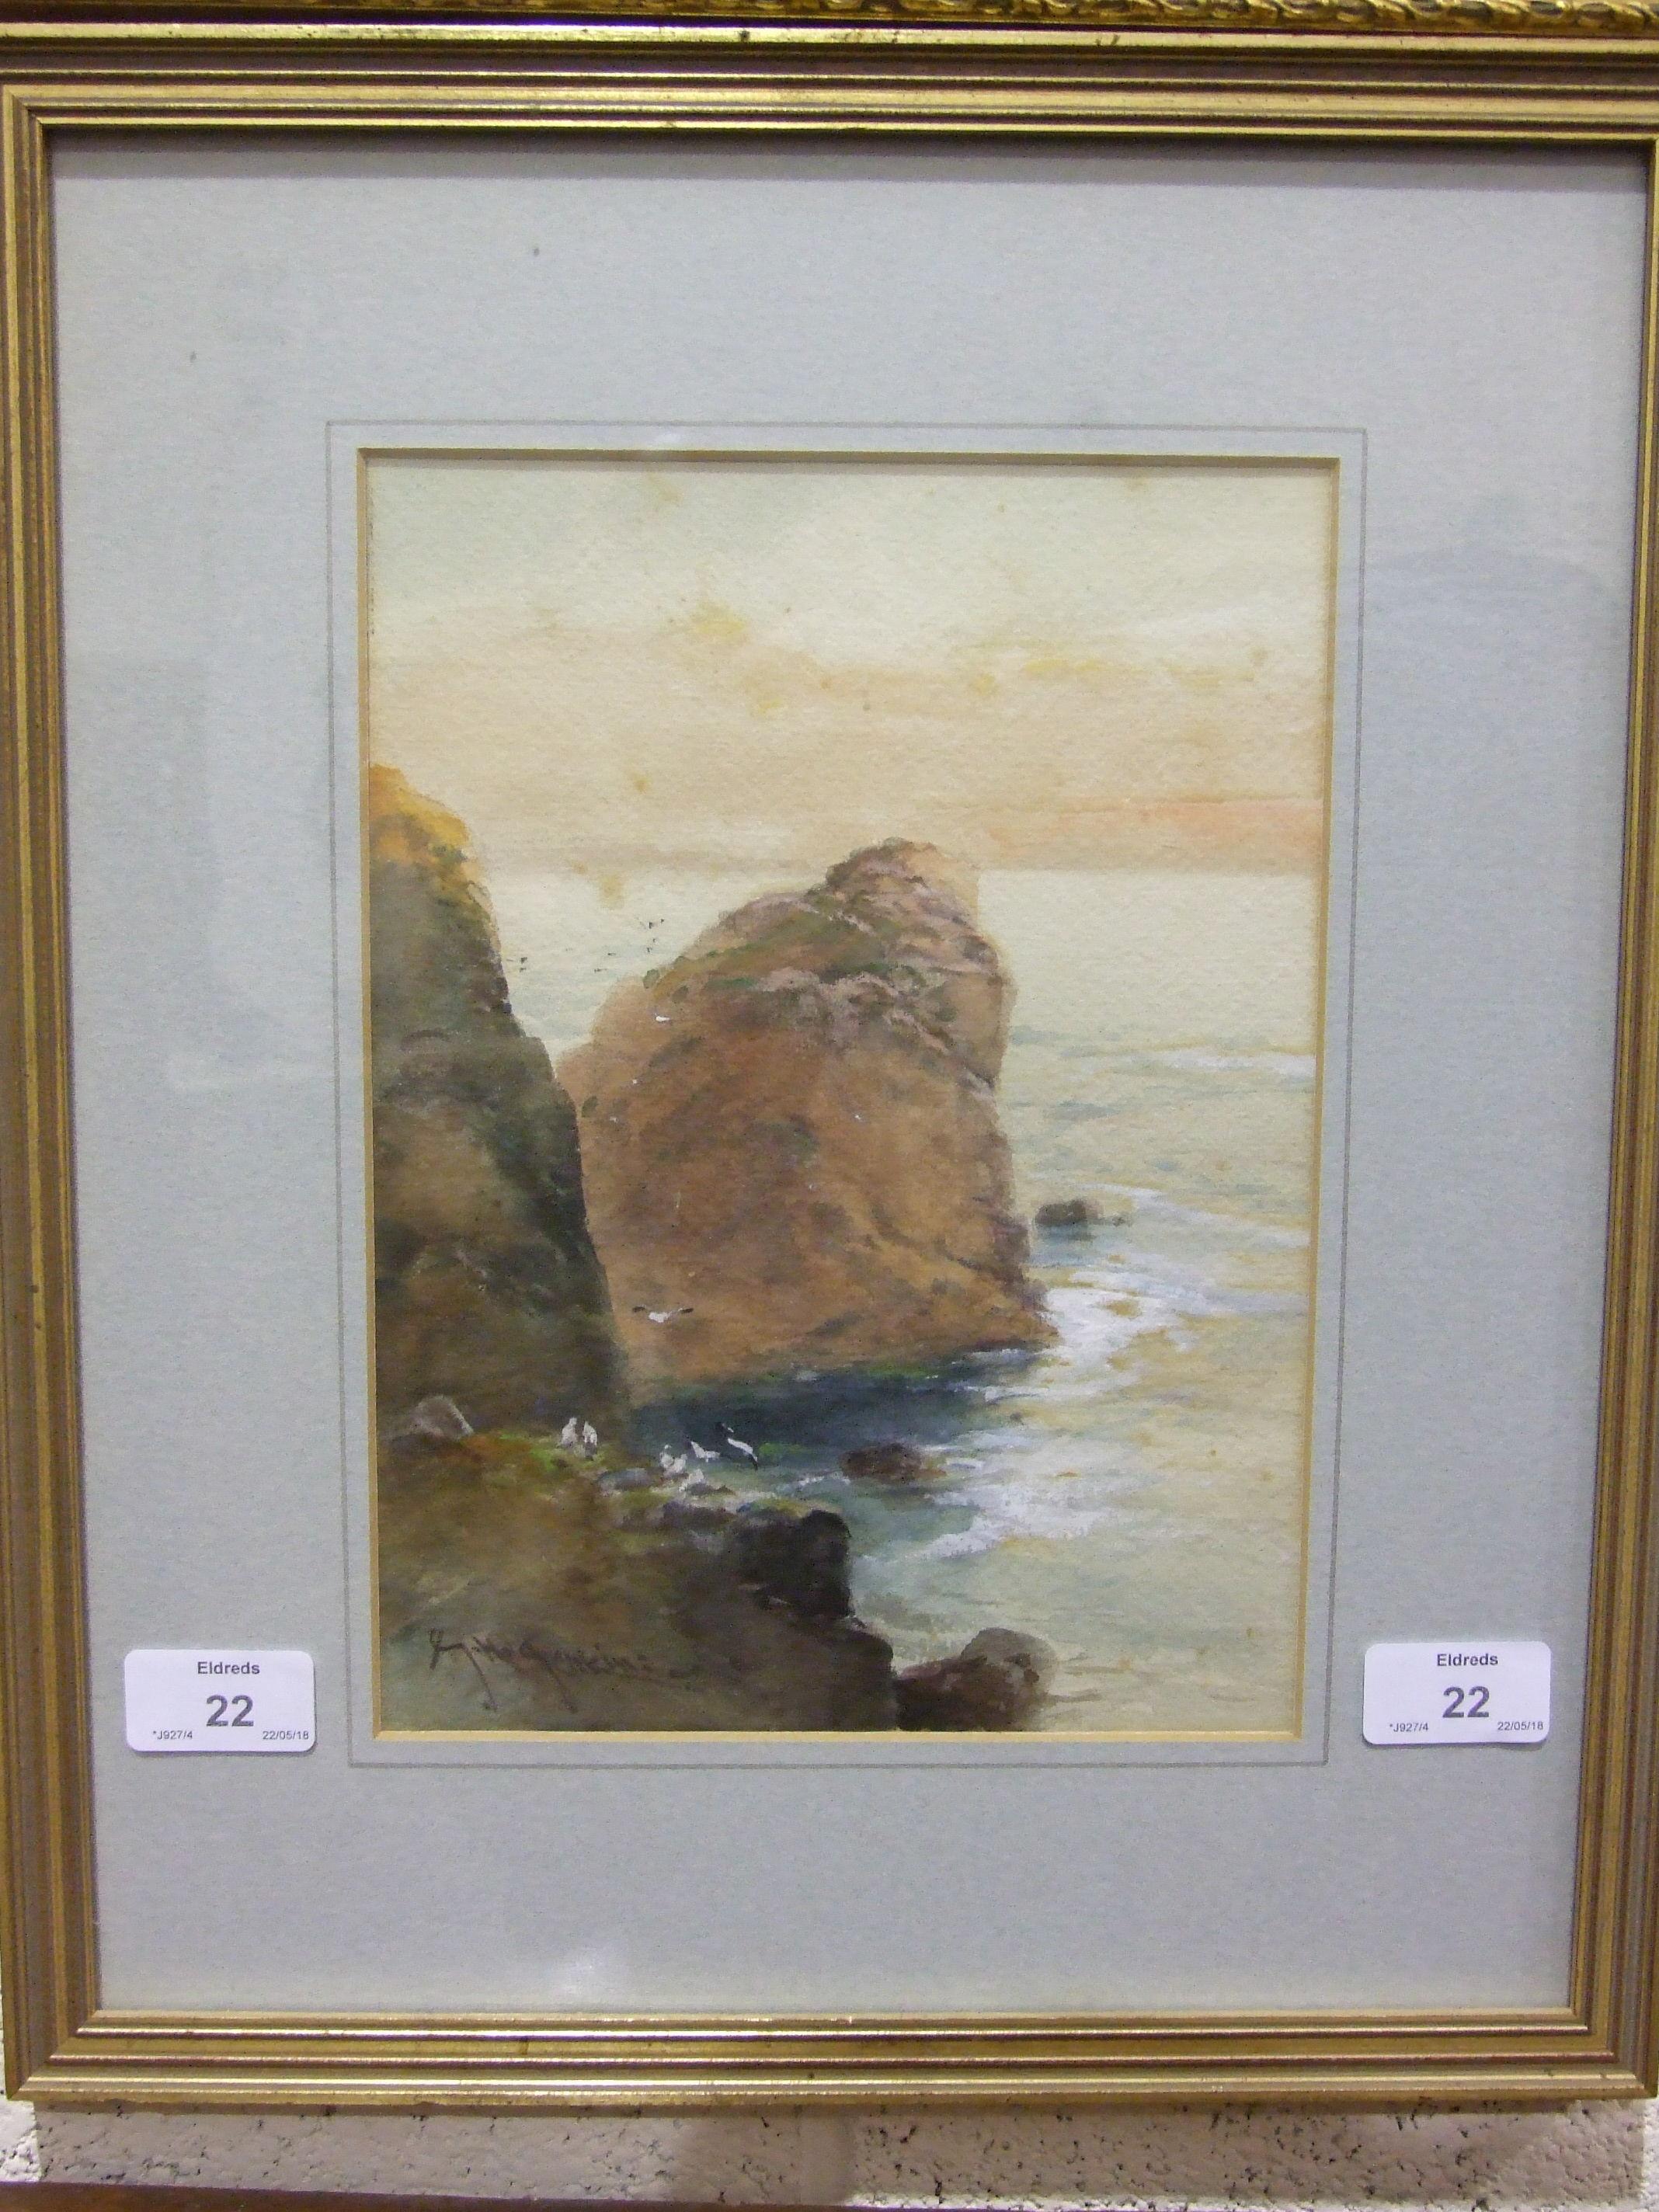 G H Jenkins (1843-1914) THE LION ROCK, KYNANCE COVE Signed watercolour, 25.5 x 19cm.